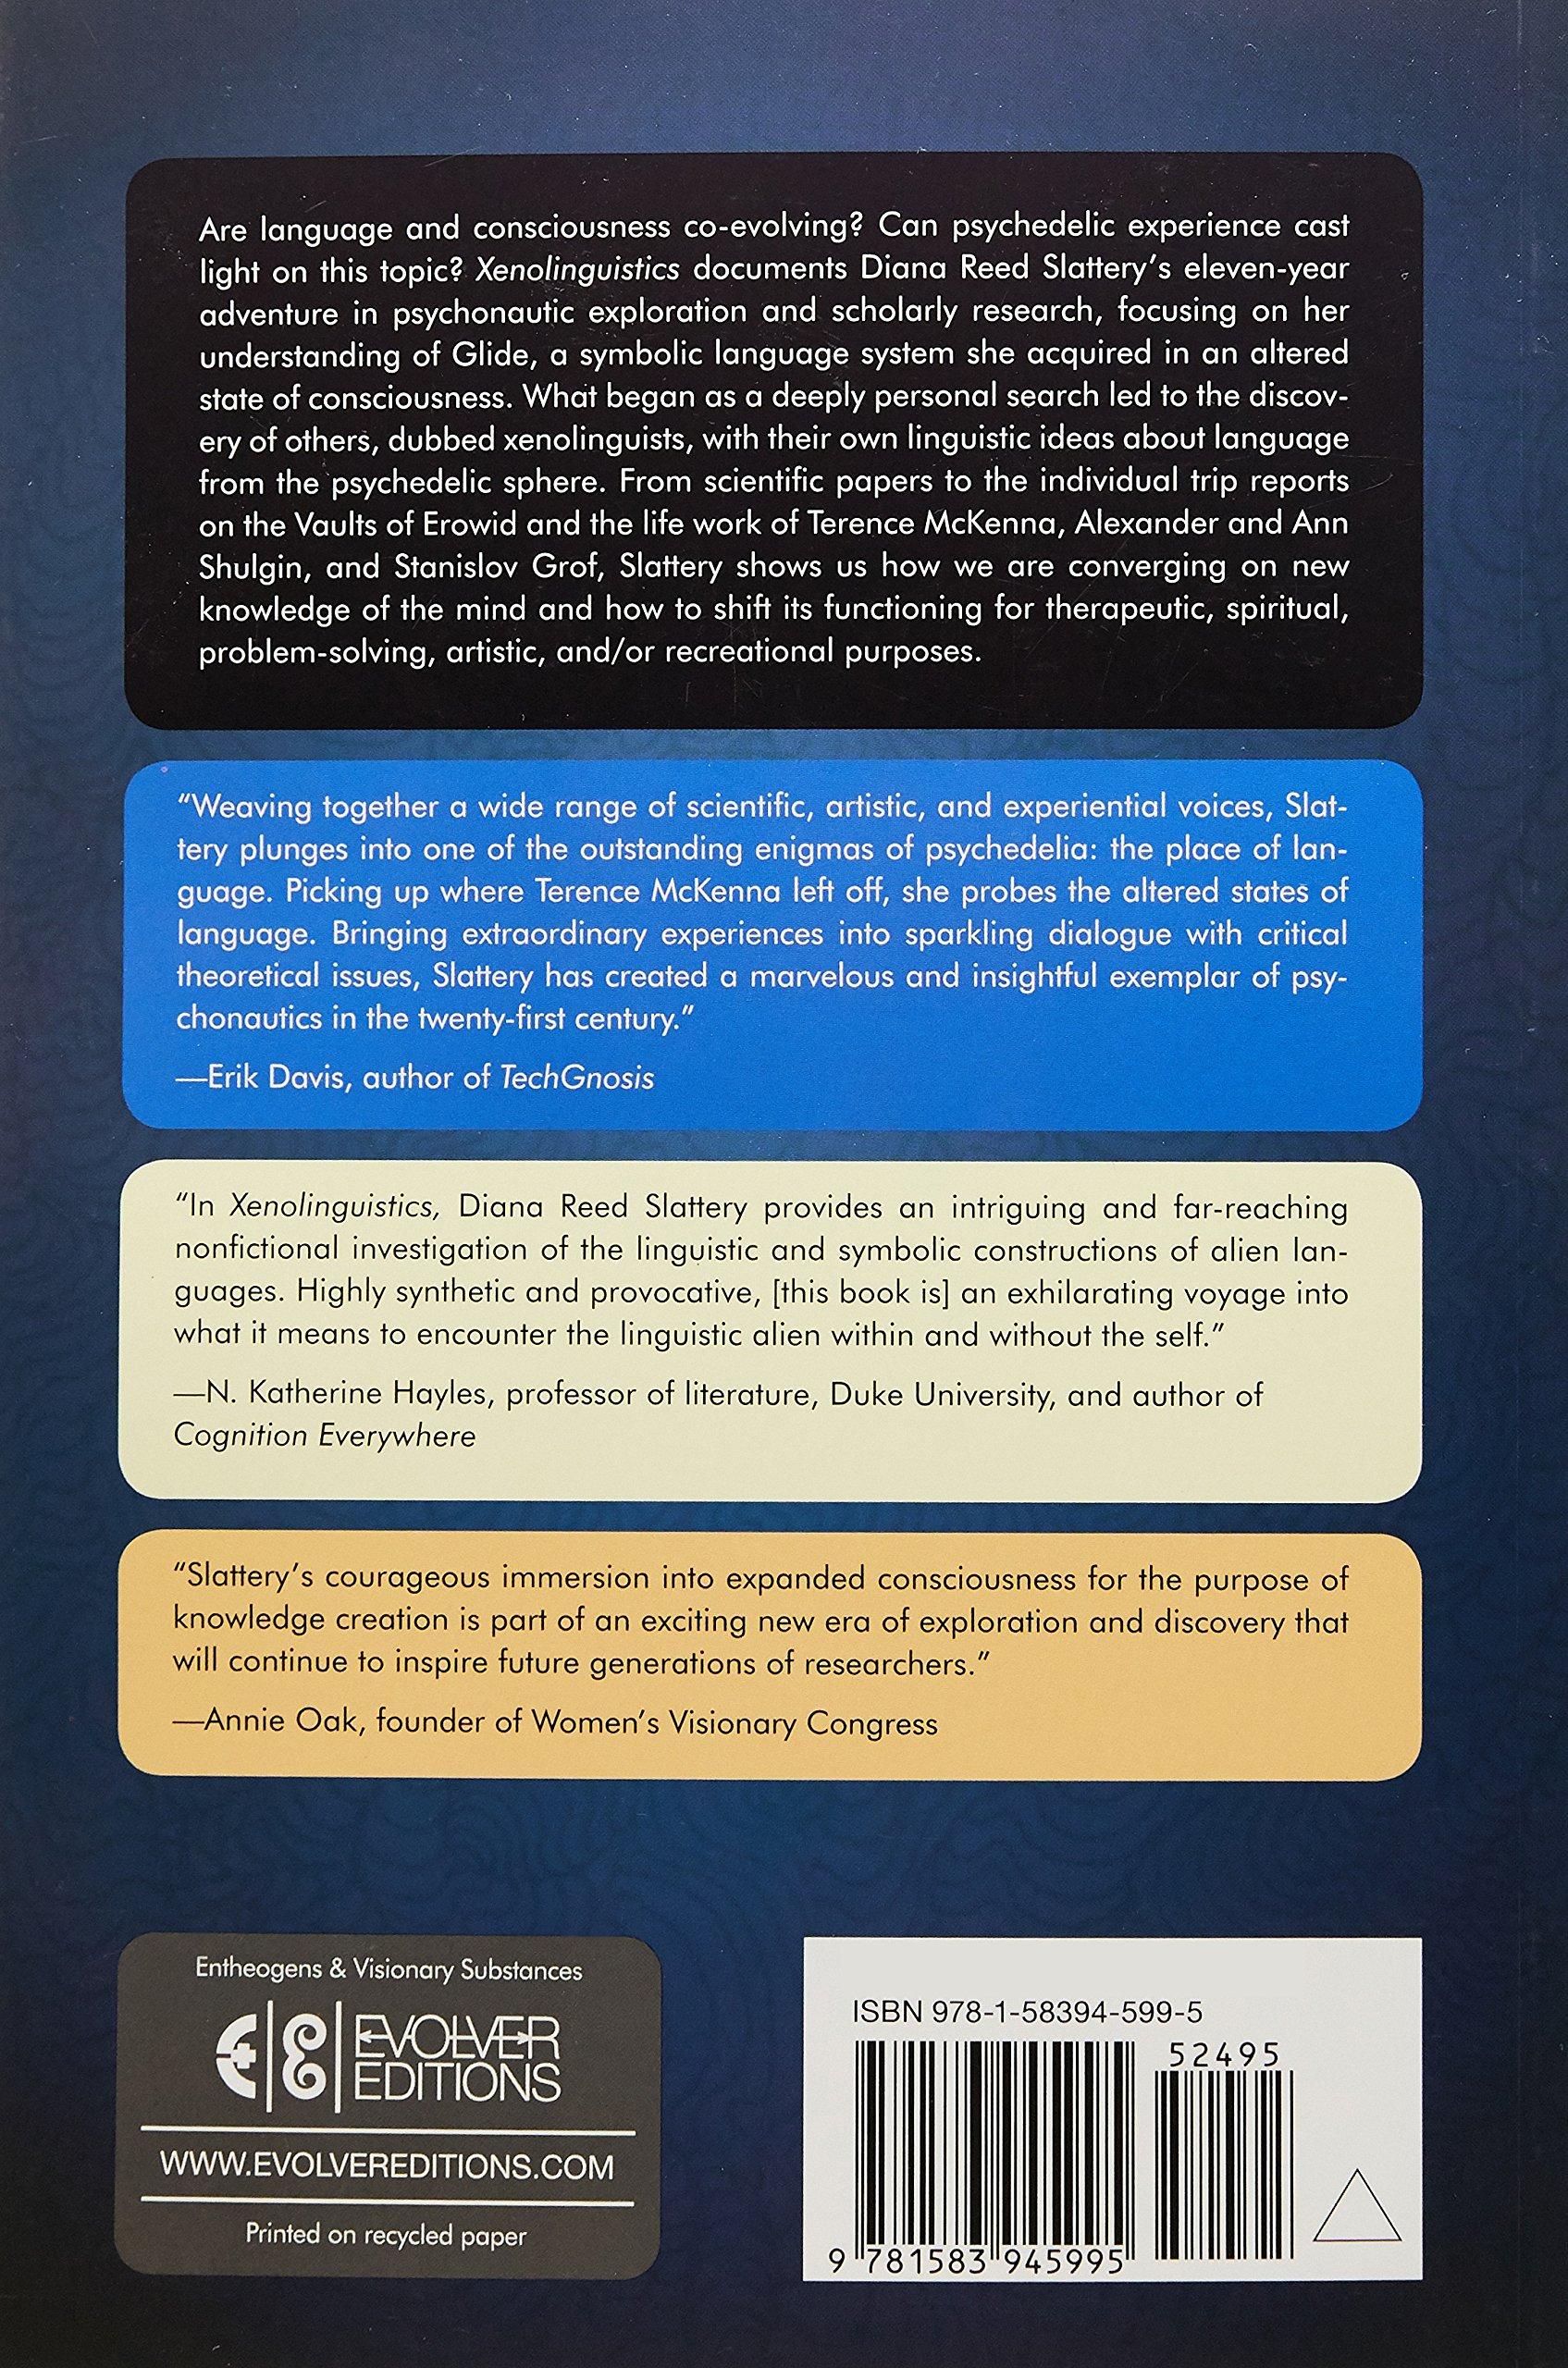 Xenolinguistics: Psychedelics, Language, and the Evolution of Consciousness:  Diana Slattery, Allyson Grey: 9781583945995: Amazon.com: Books